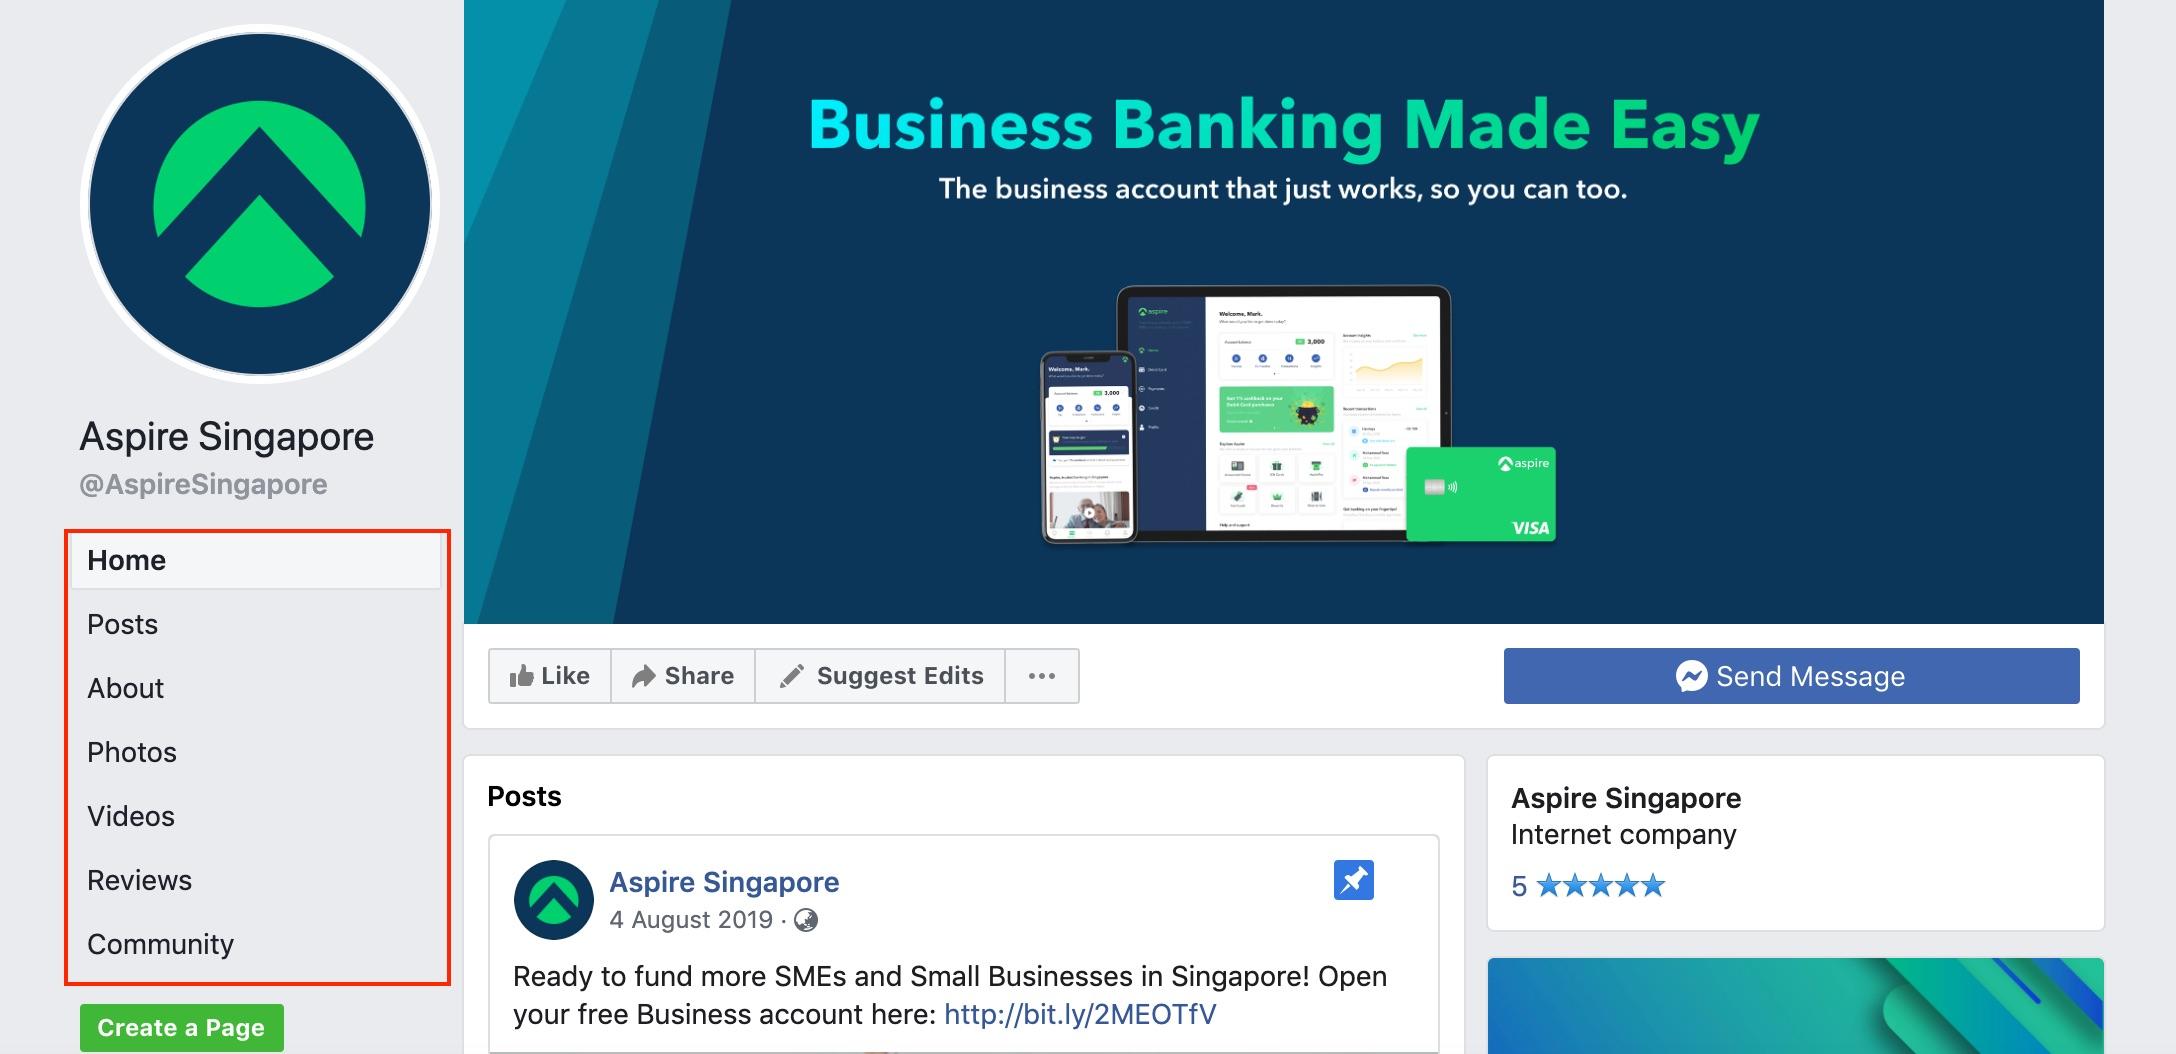 AspireSingapore Facebook page tab. CC: AspireSingapore Facebook page